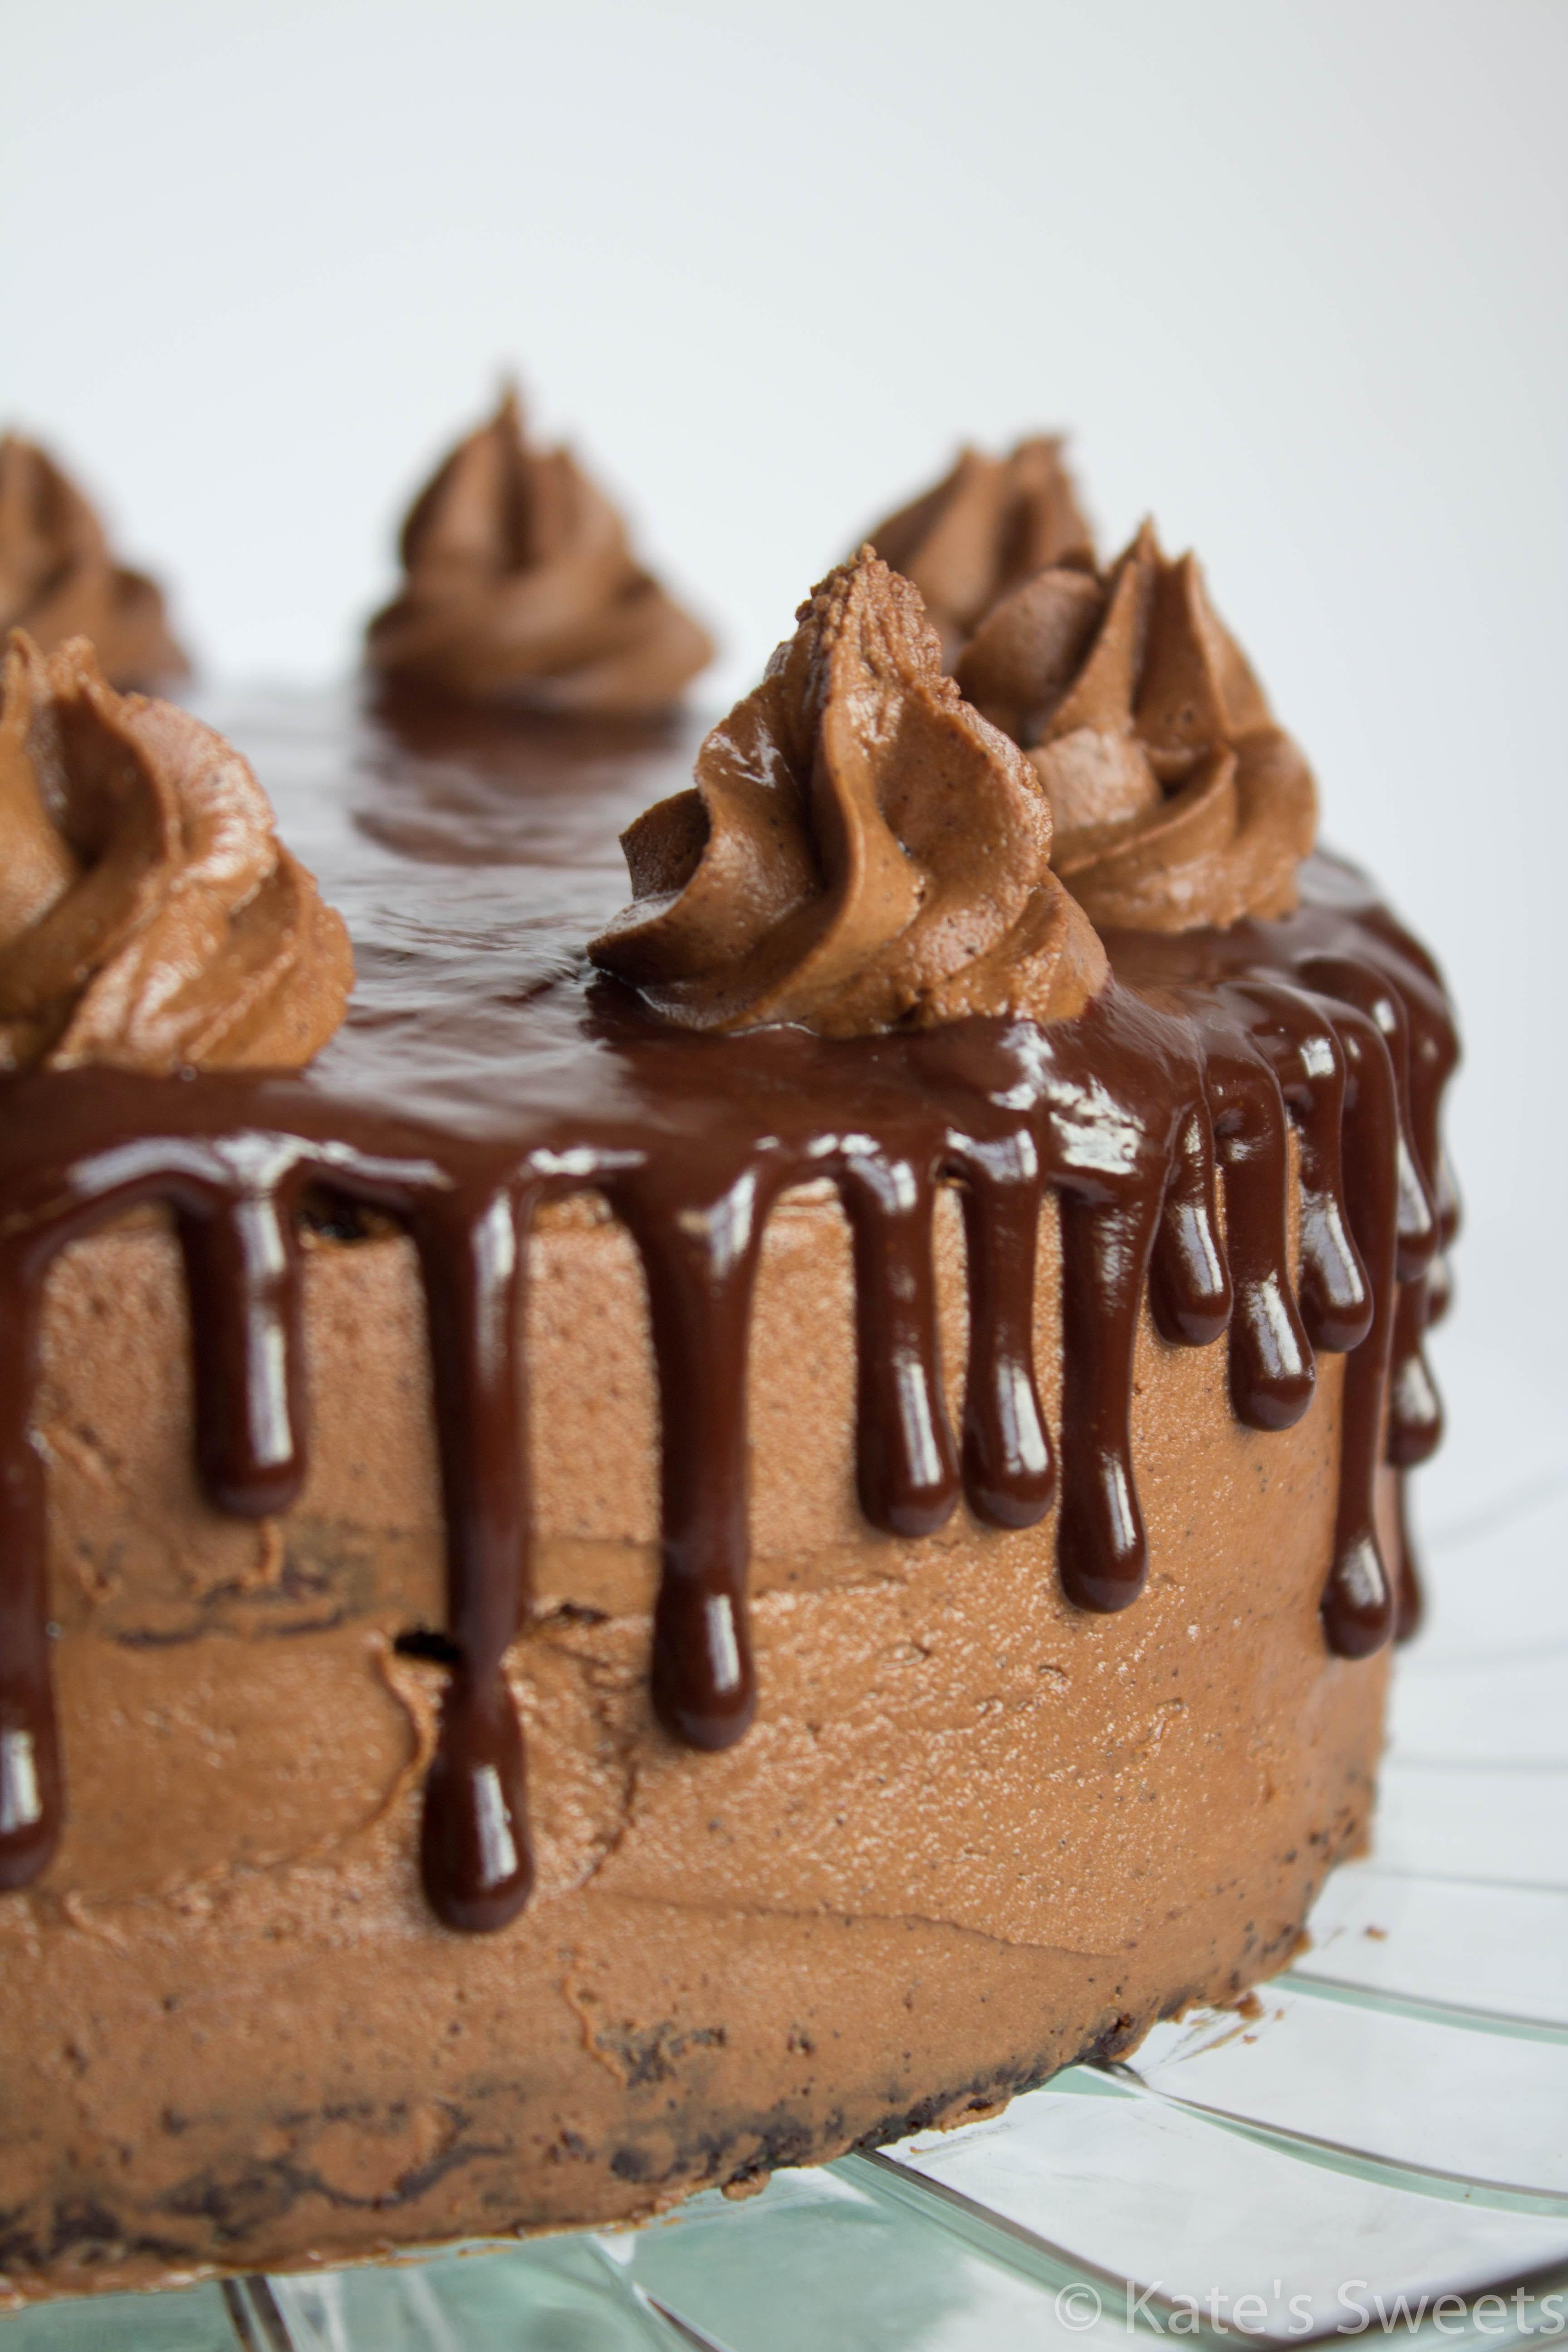 Chocolate Mocha Cake  Mocha Chocolate Cake Kate s Sweets